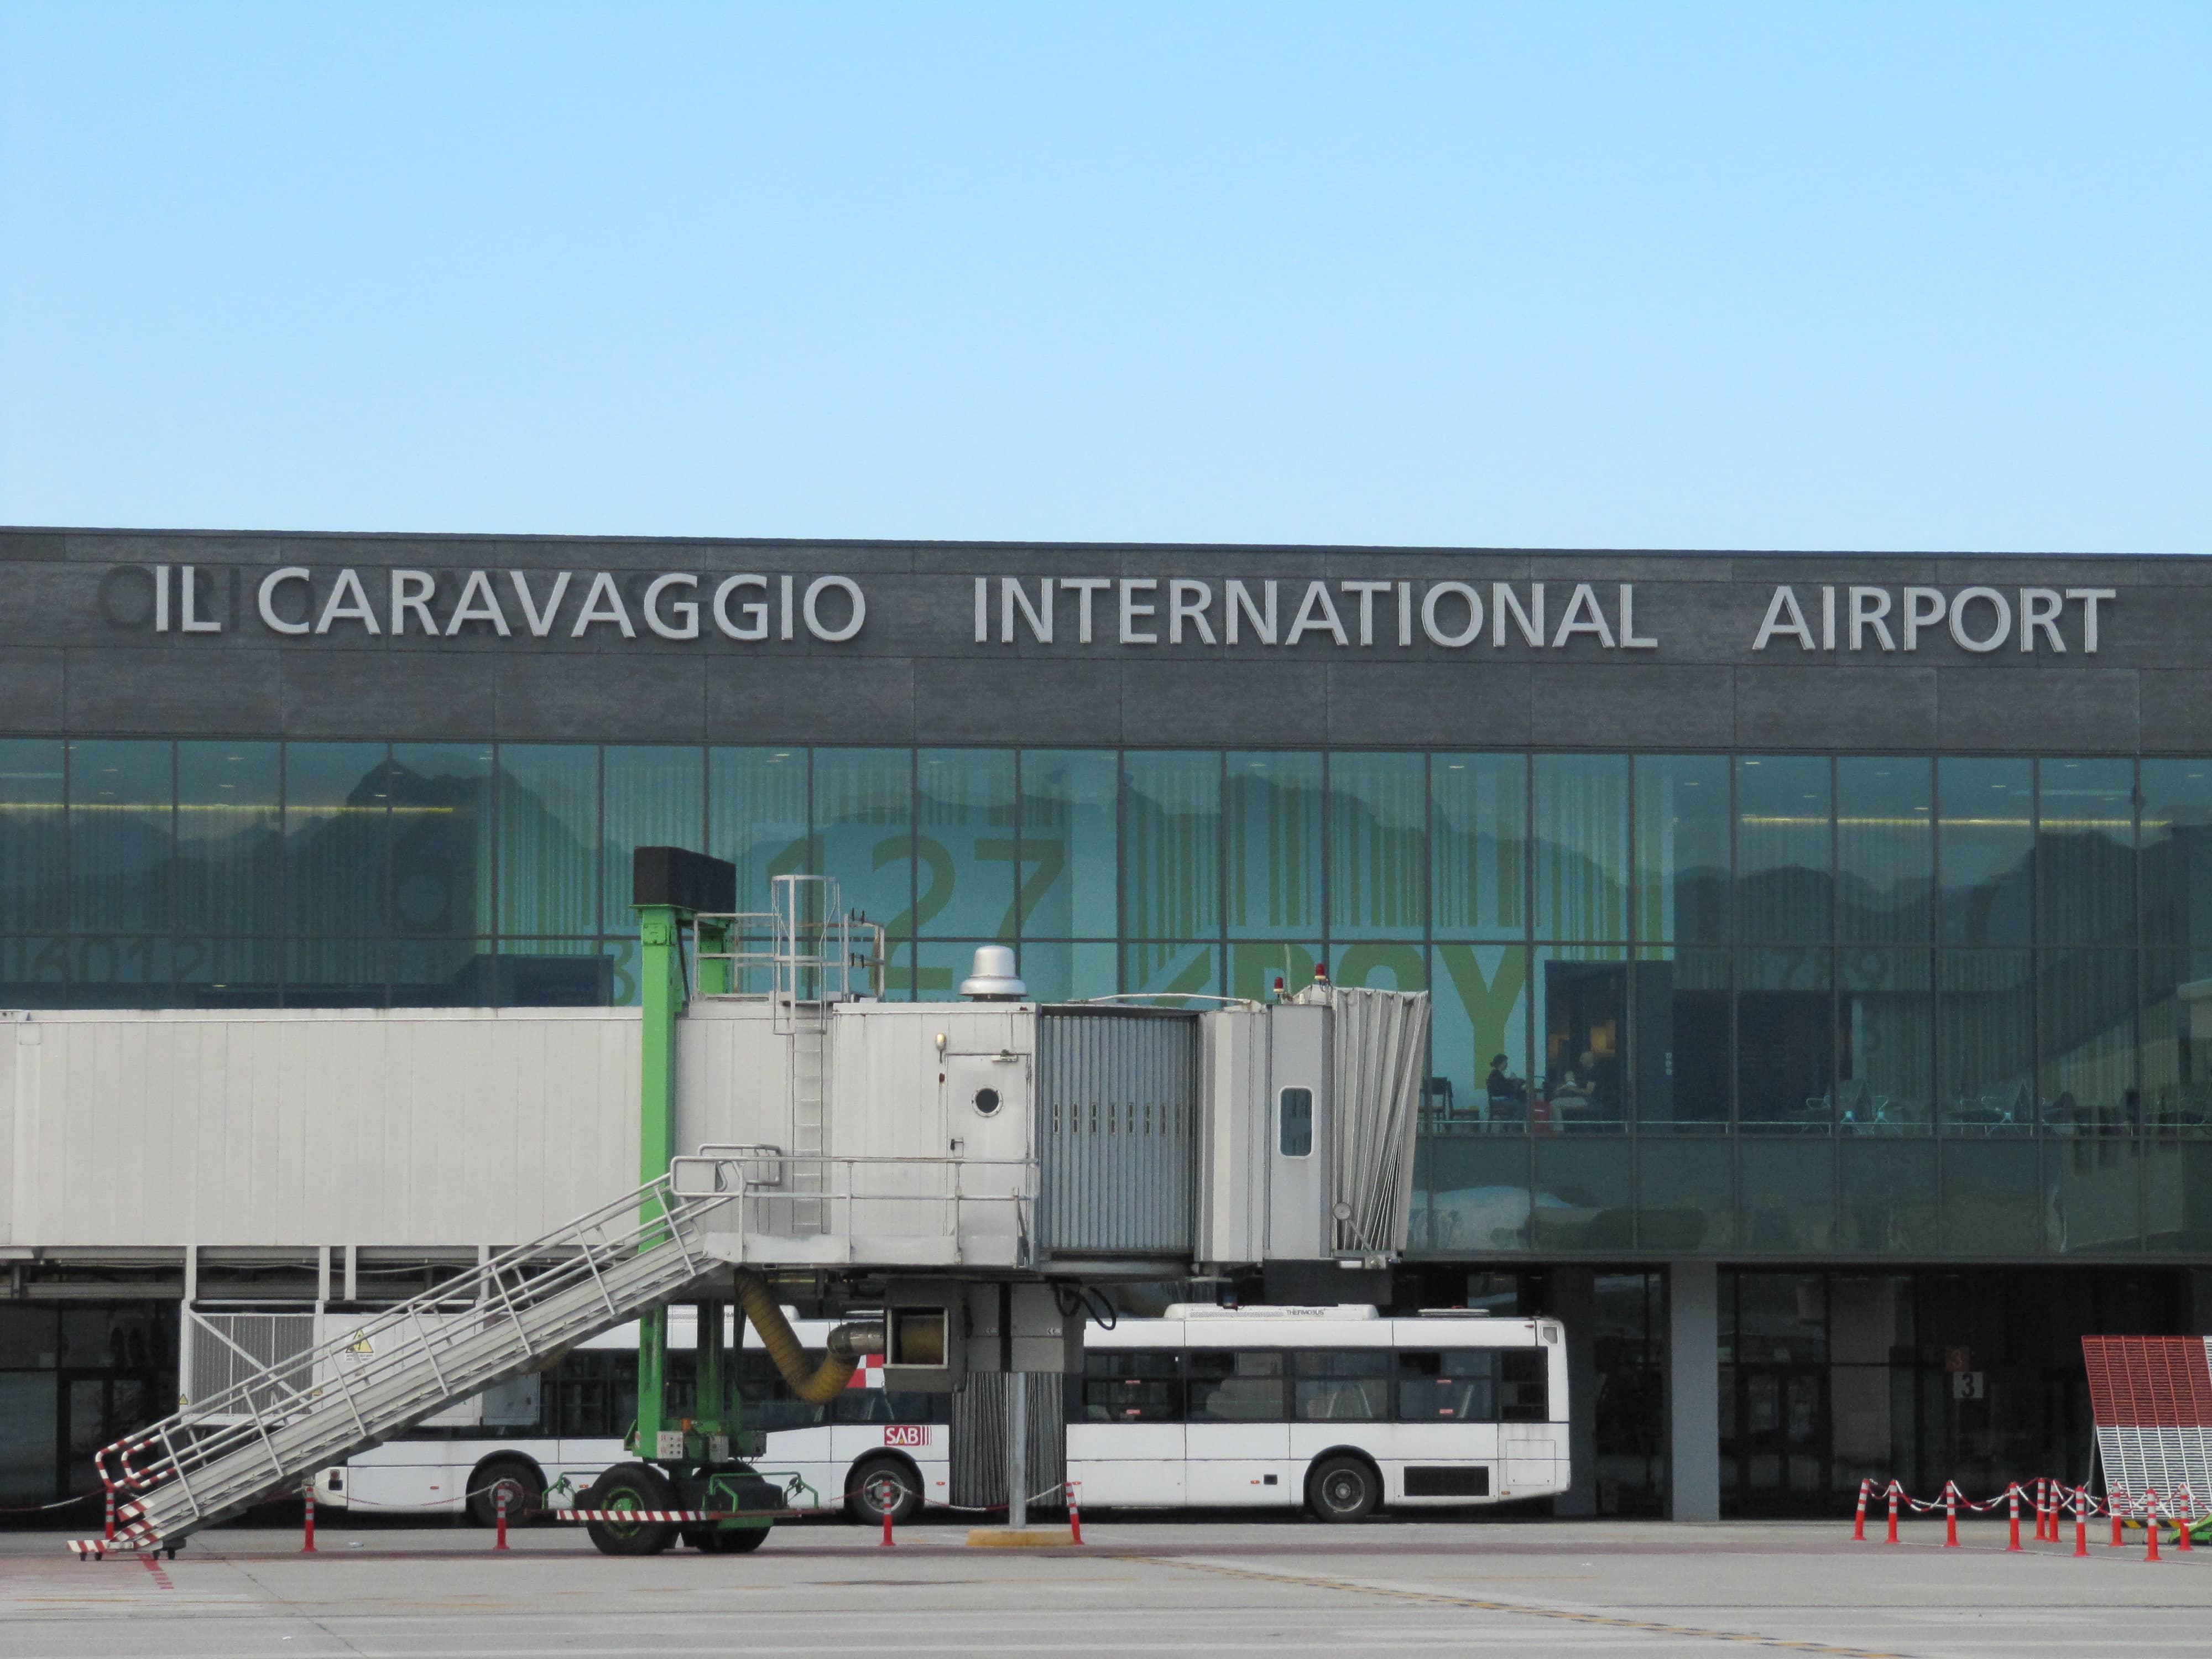 modellismo aeroporto bergamo - photo#20